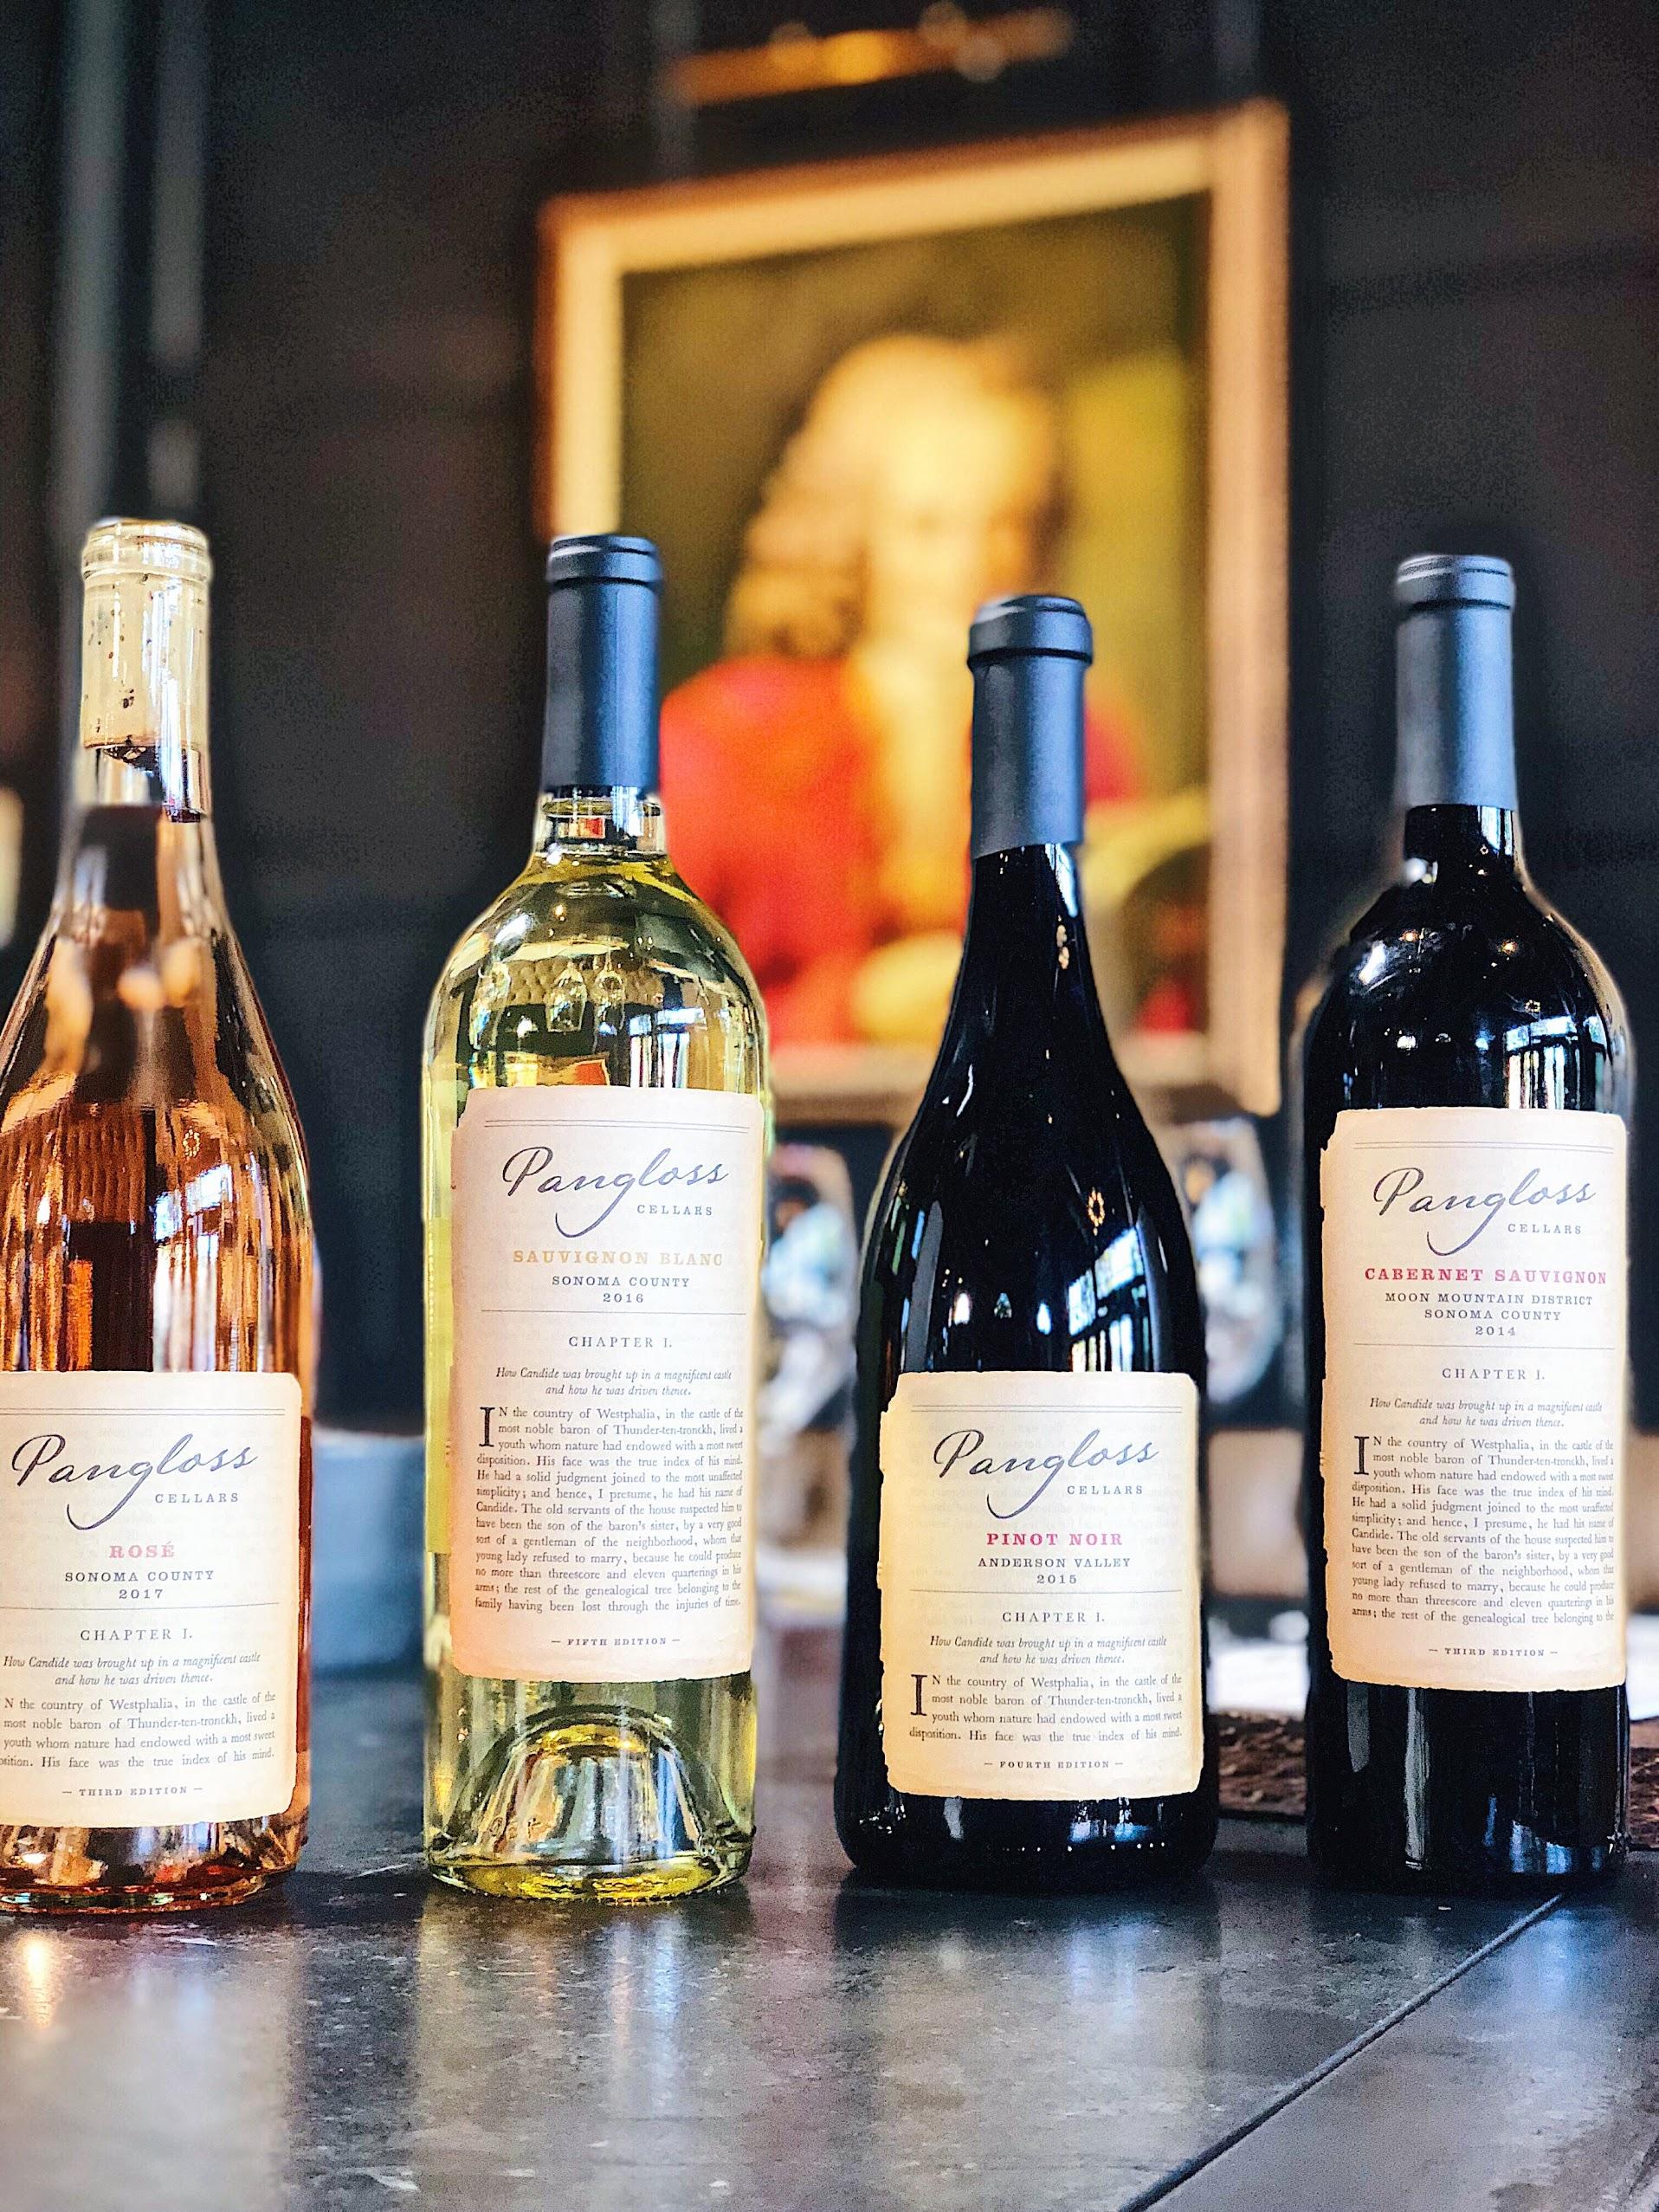 Pangloss Cellars Pinot, Rosé, Cabernet, Zinfandel Wines